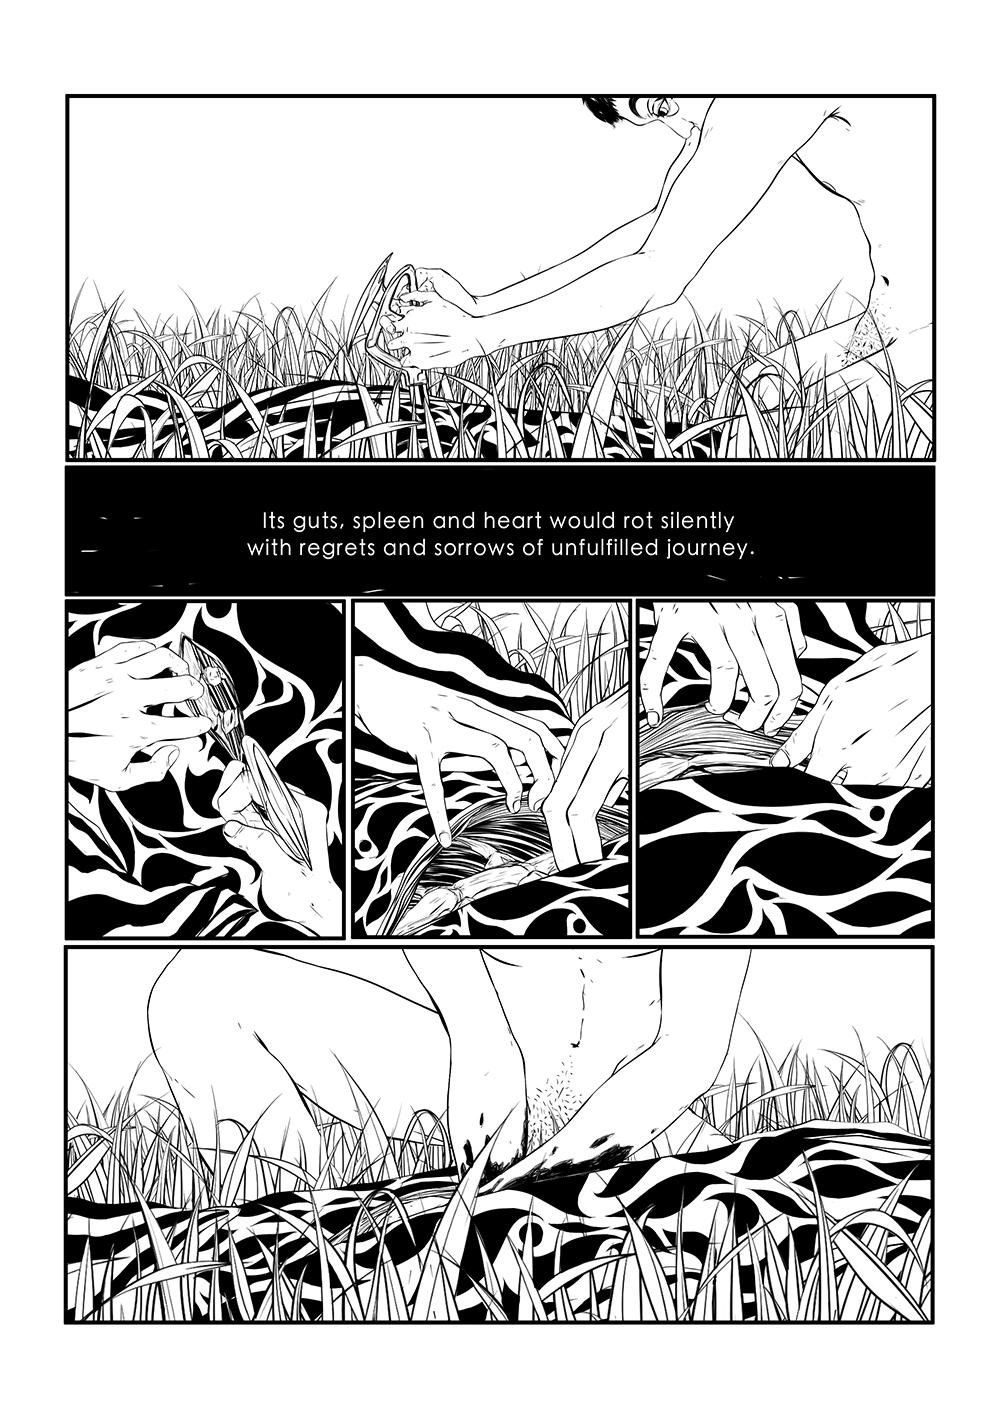 mojowang_illustration_betweenrivers_24_7.jpg